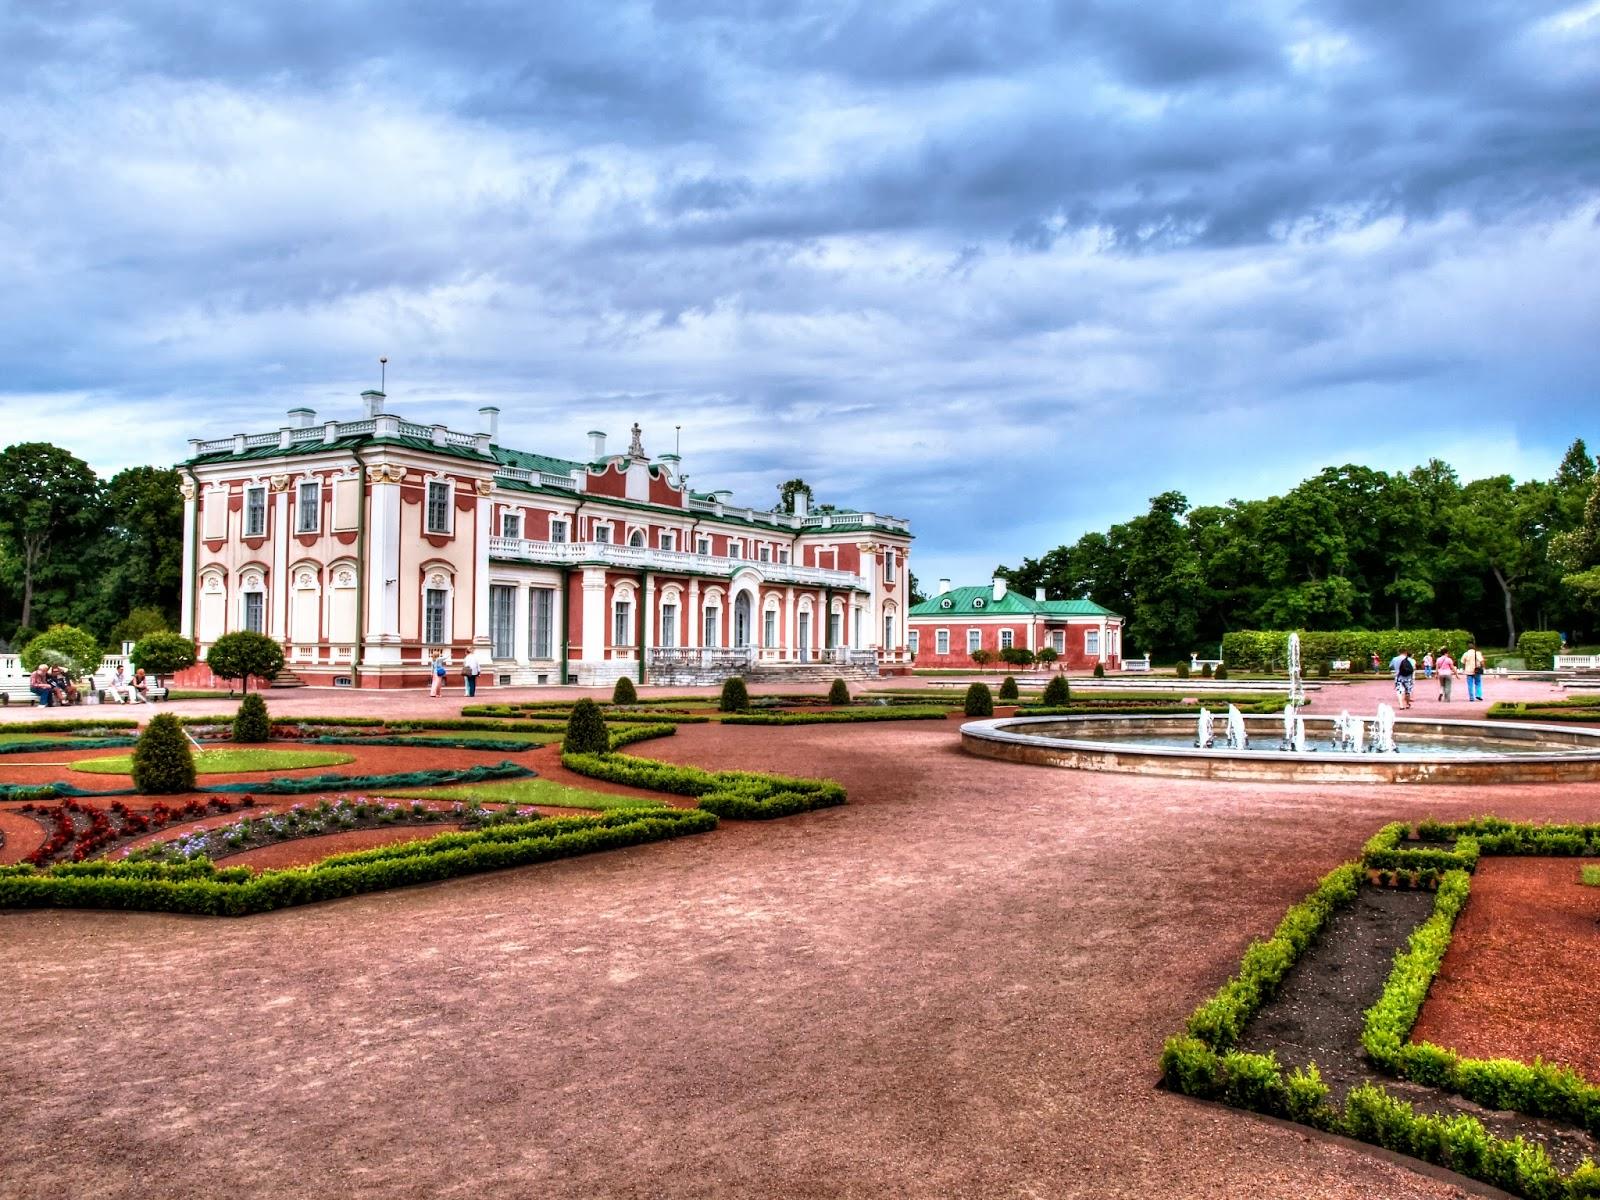 Таллиннский Парк Кадриорг - детище Петра